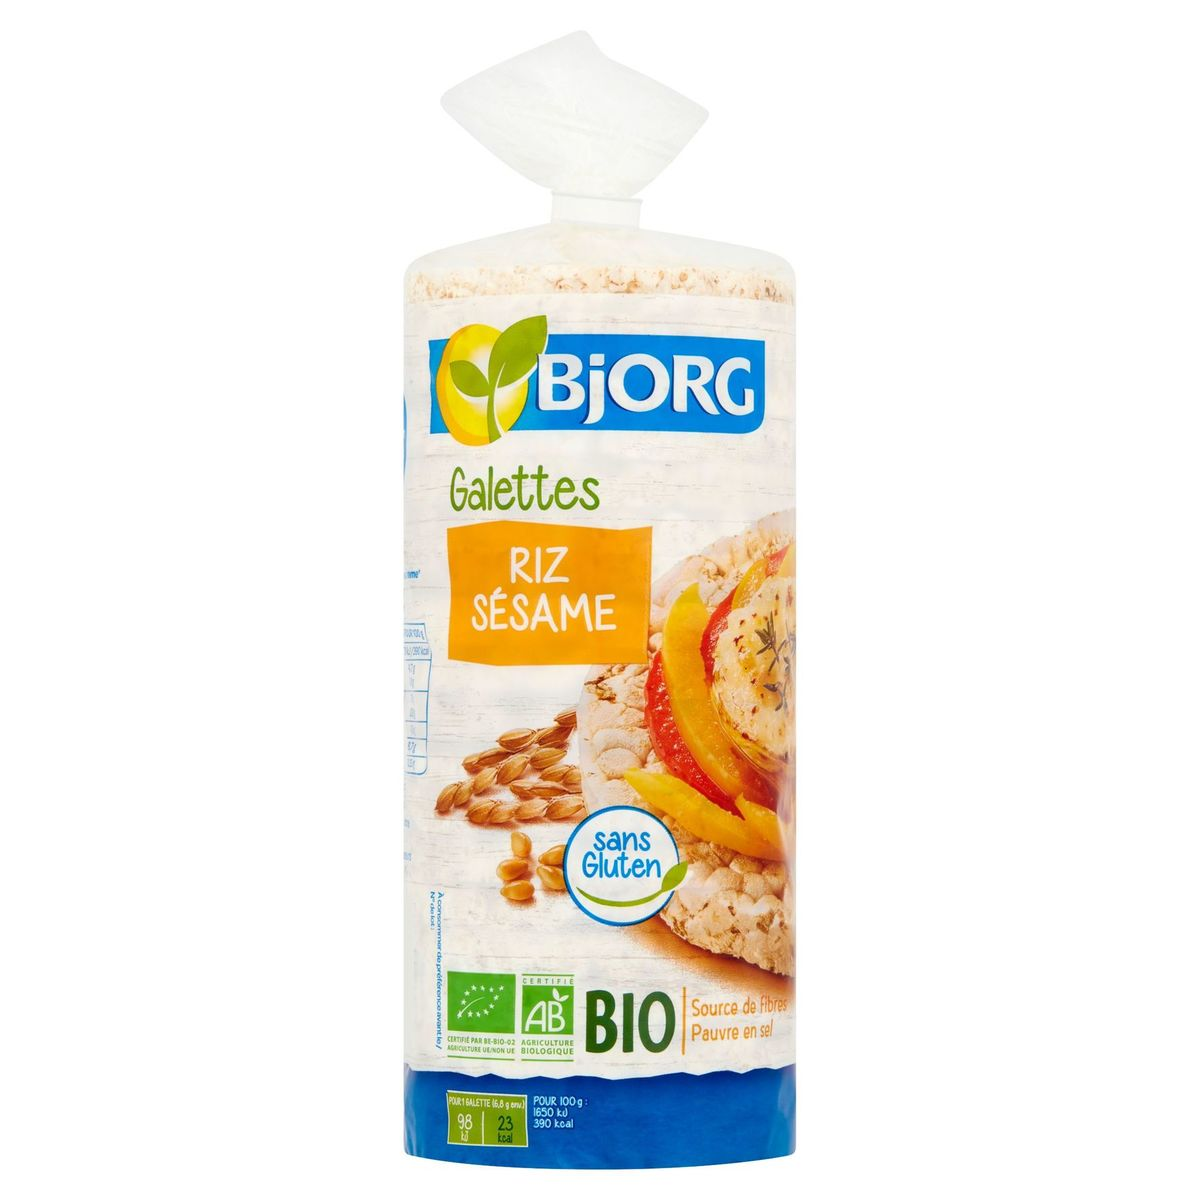 Bjorg Galettes Riz Sésame Bio 130 g